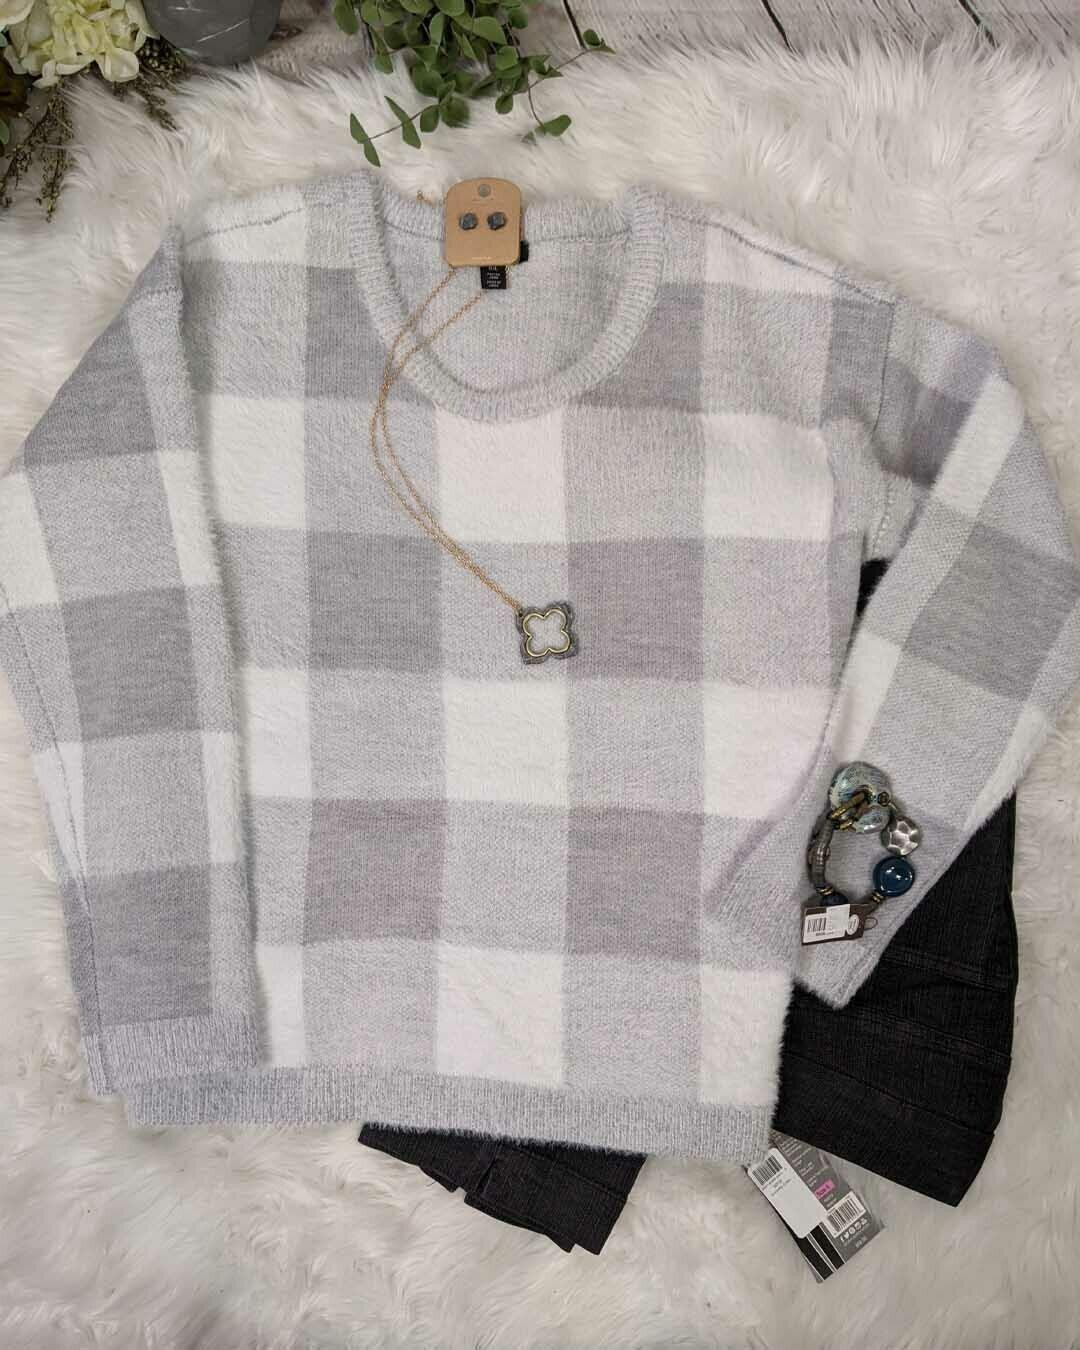 Cami Sweater